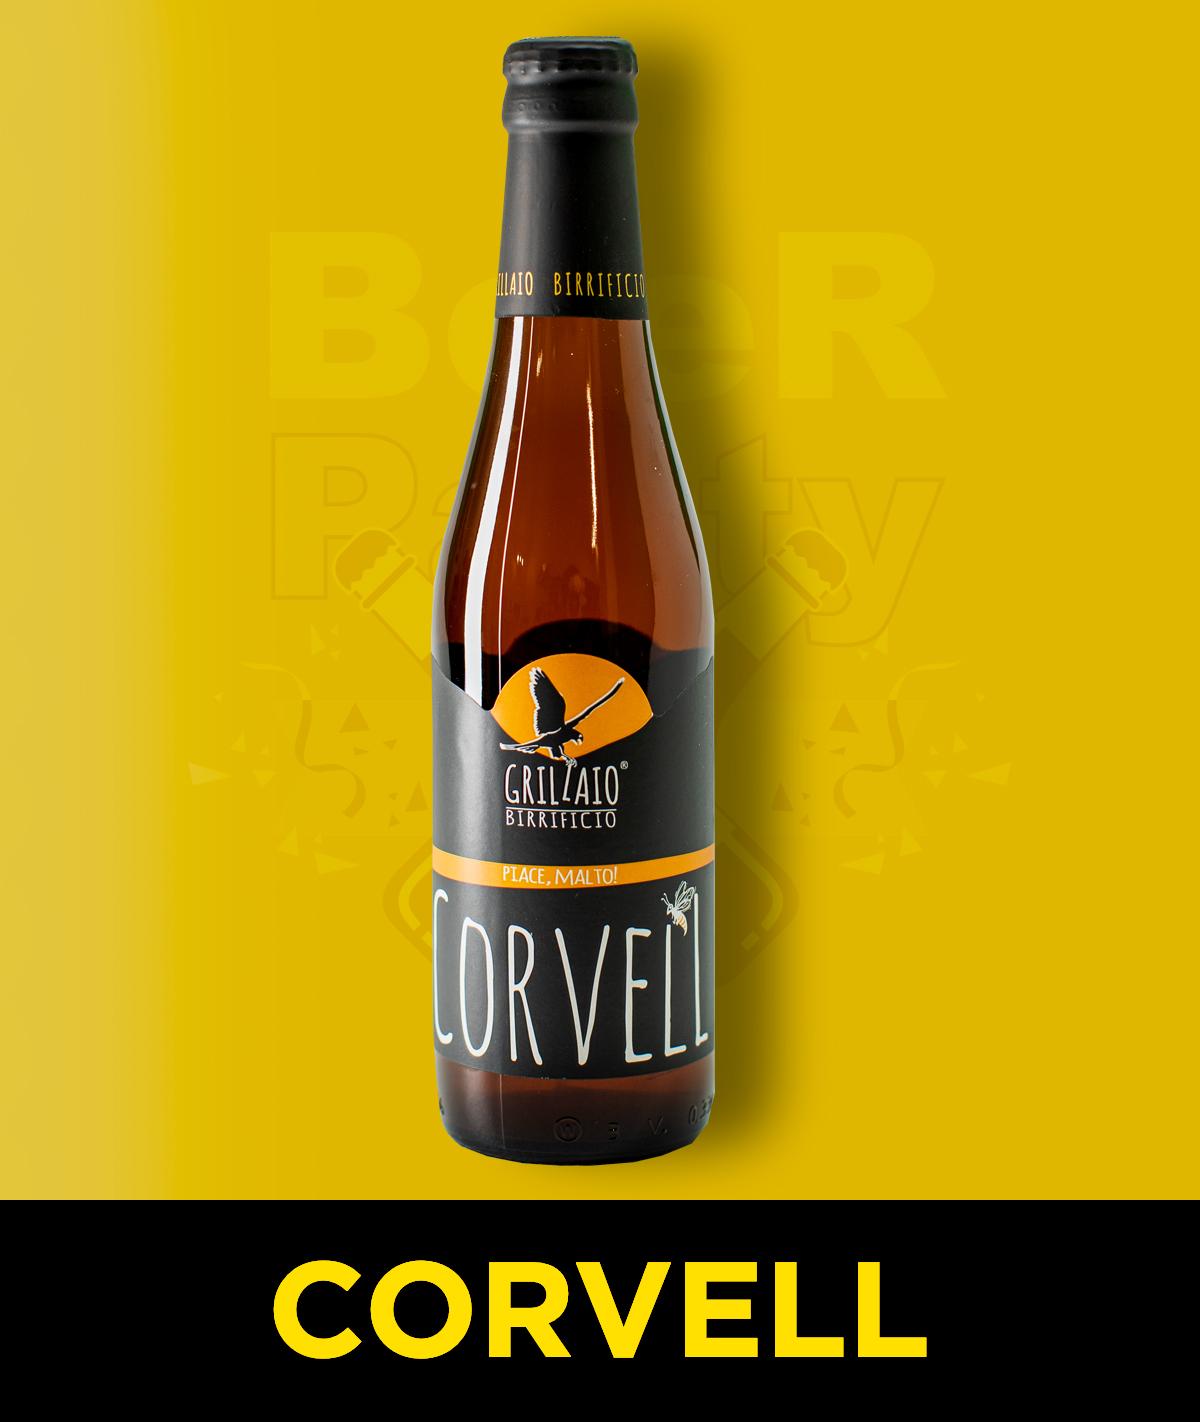 corvell